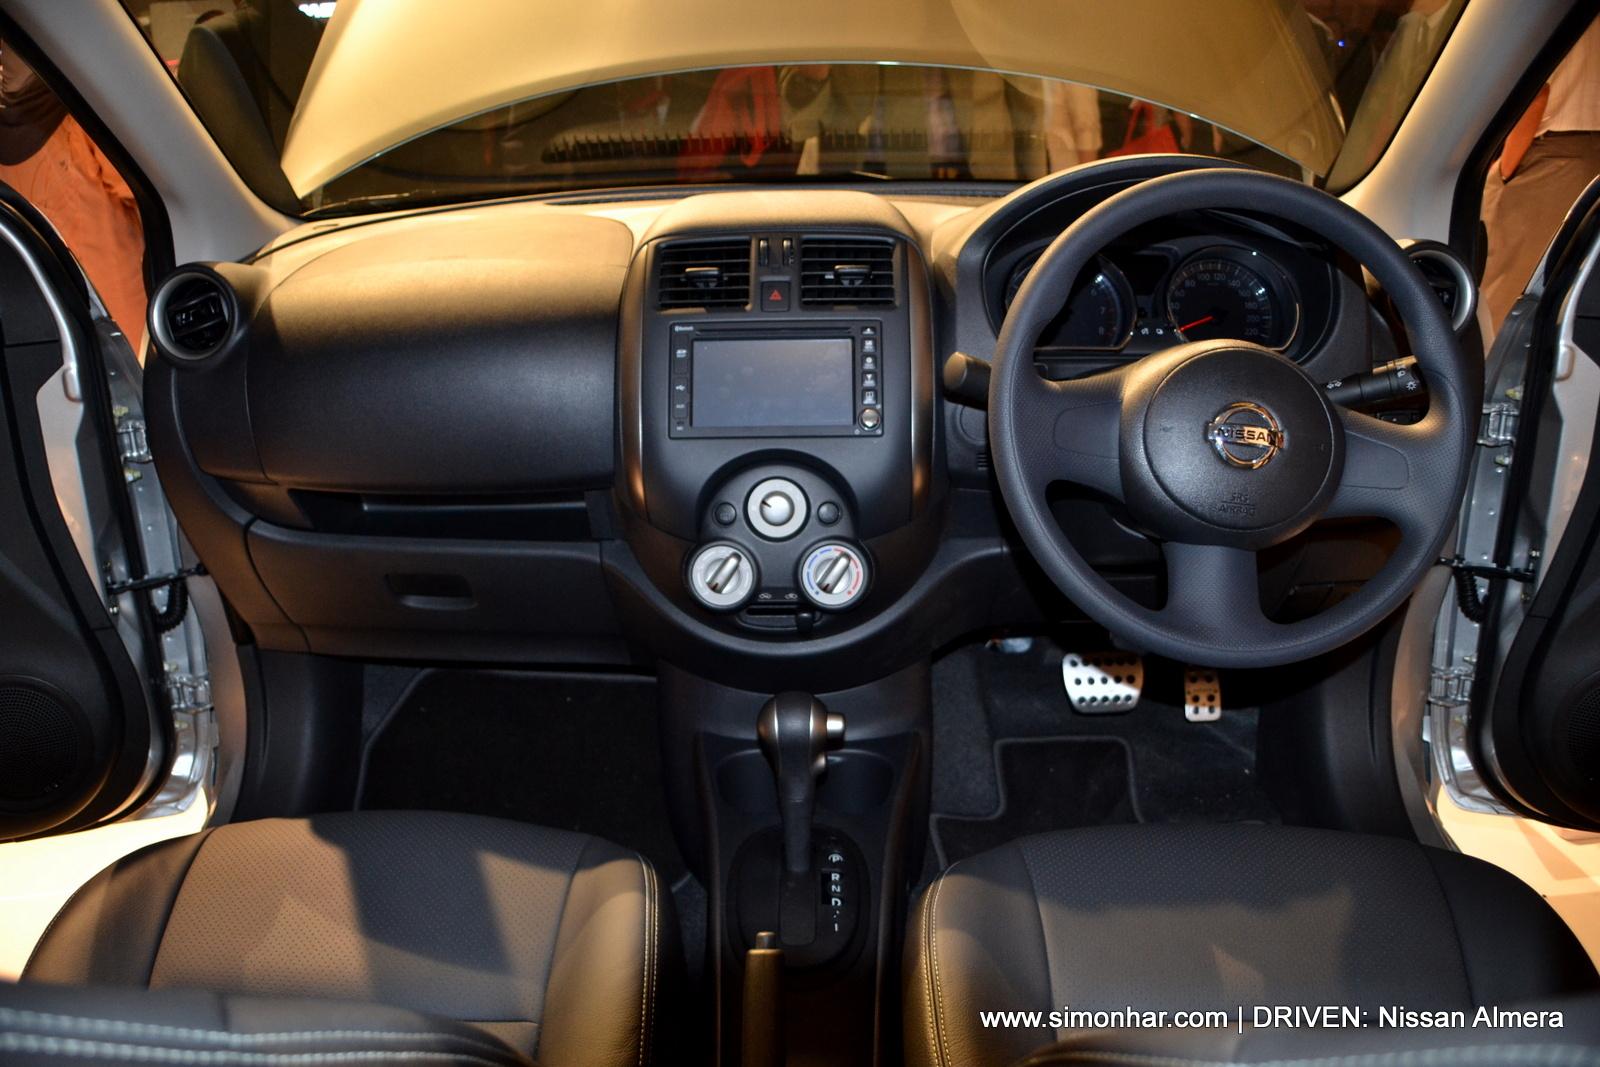 DRIVEN: Nissan Almera 1.5 CVTC ! Simon Har